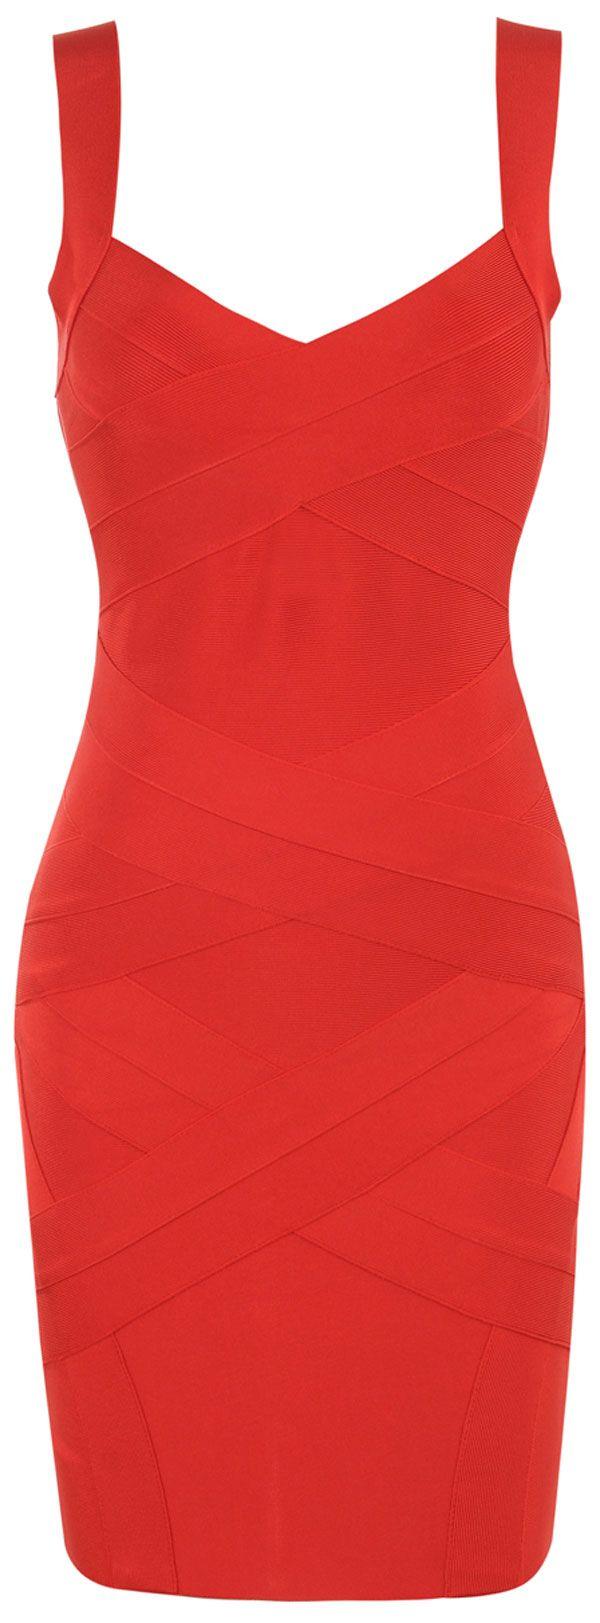 'Jennifer' Cross Back Red Bandage Dress